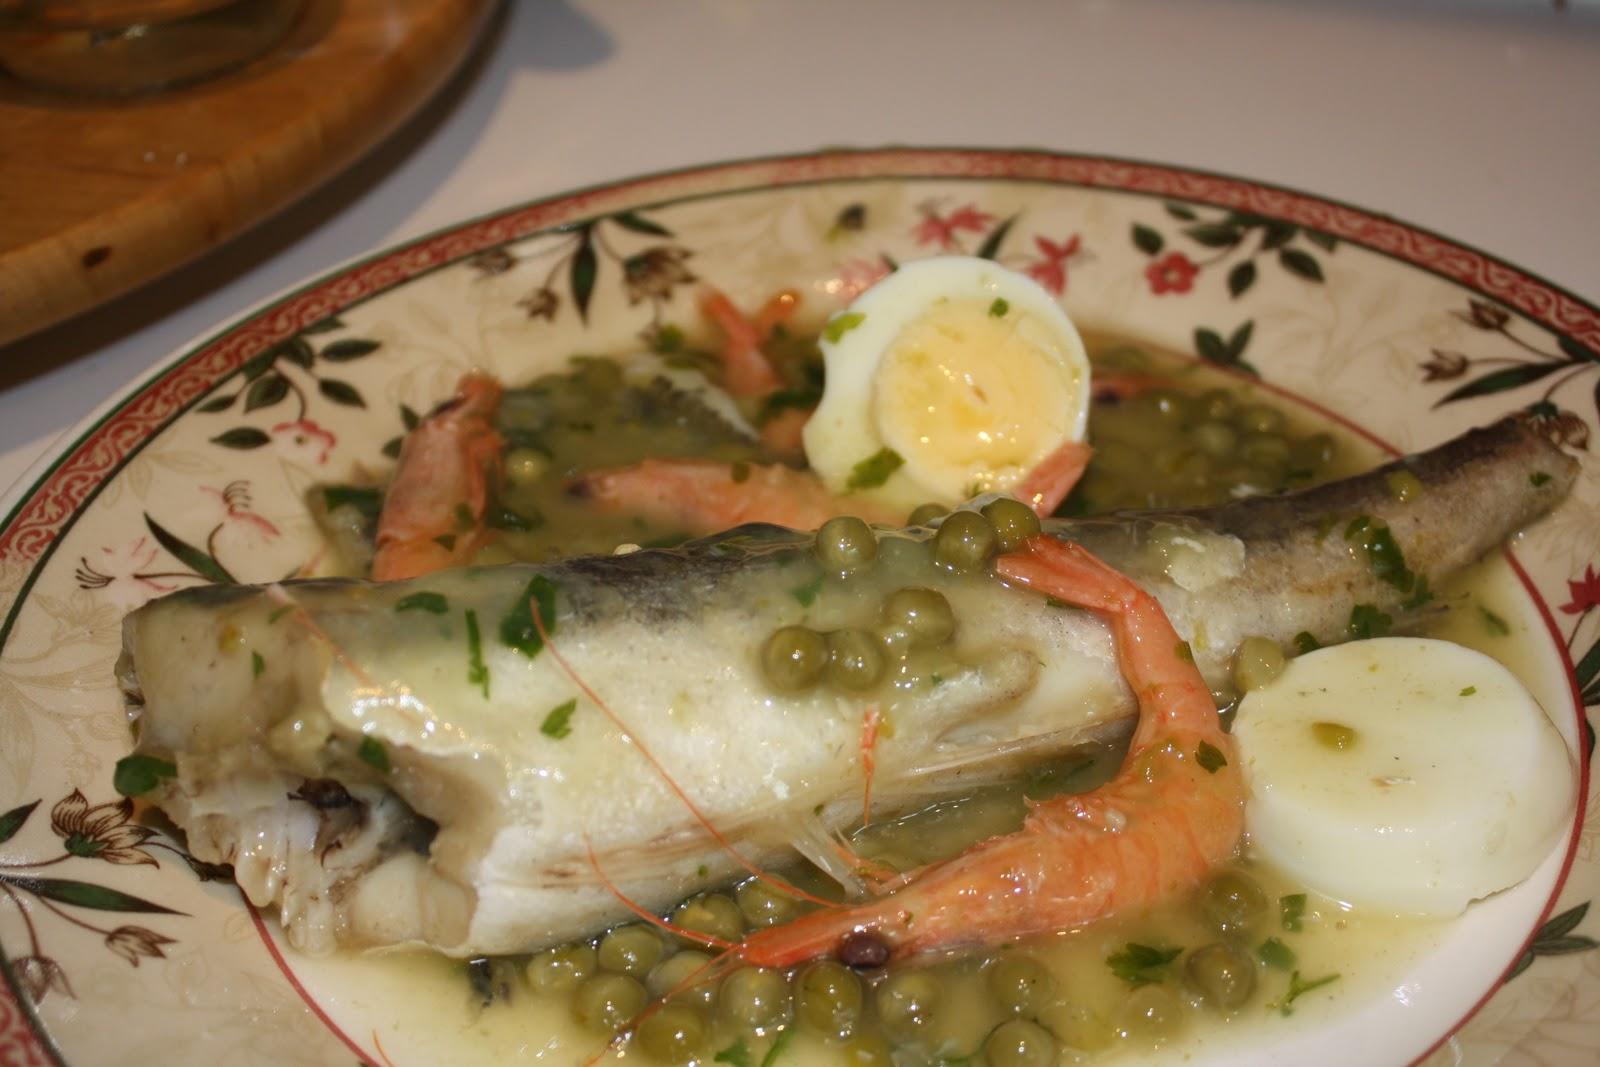 Colas de merluza en salsa verde receta de cocina - Cocinar pescado en microondas ...